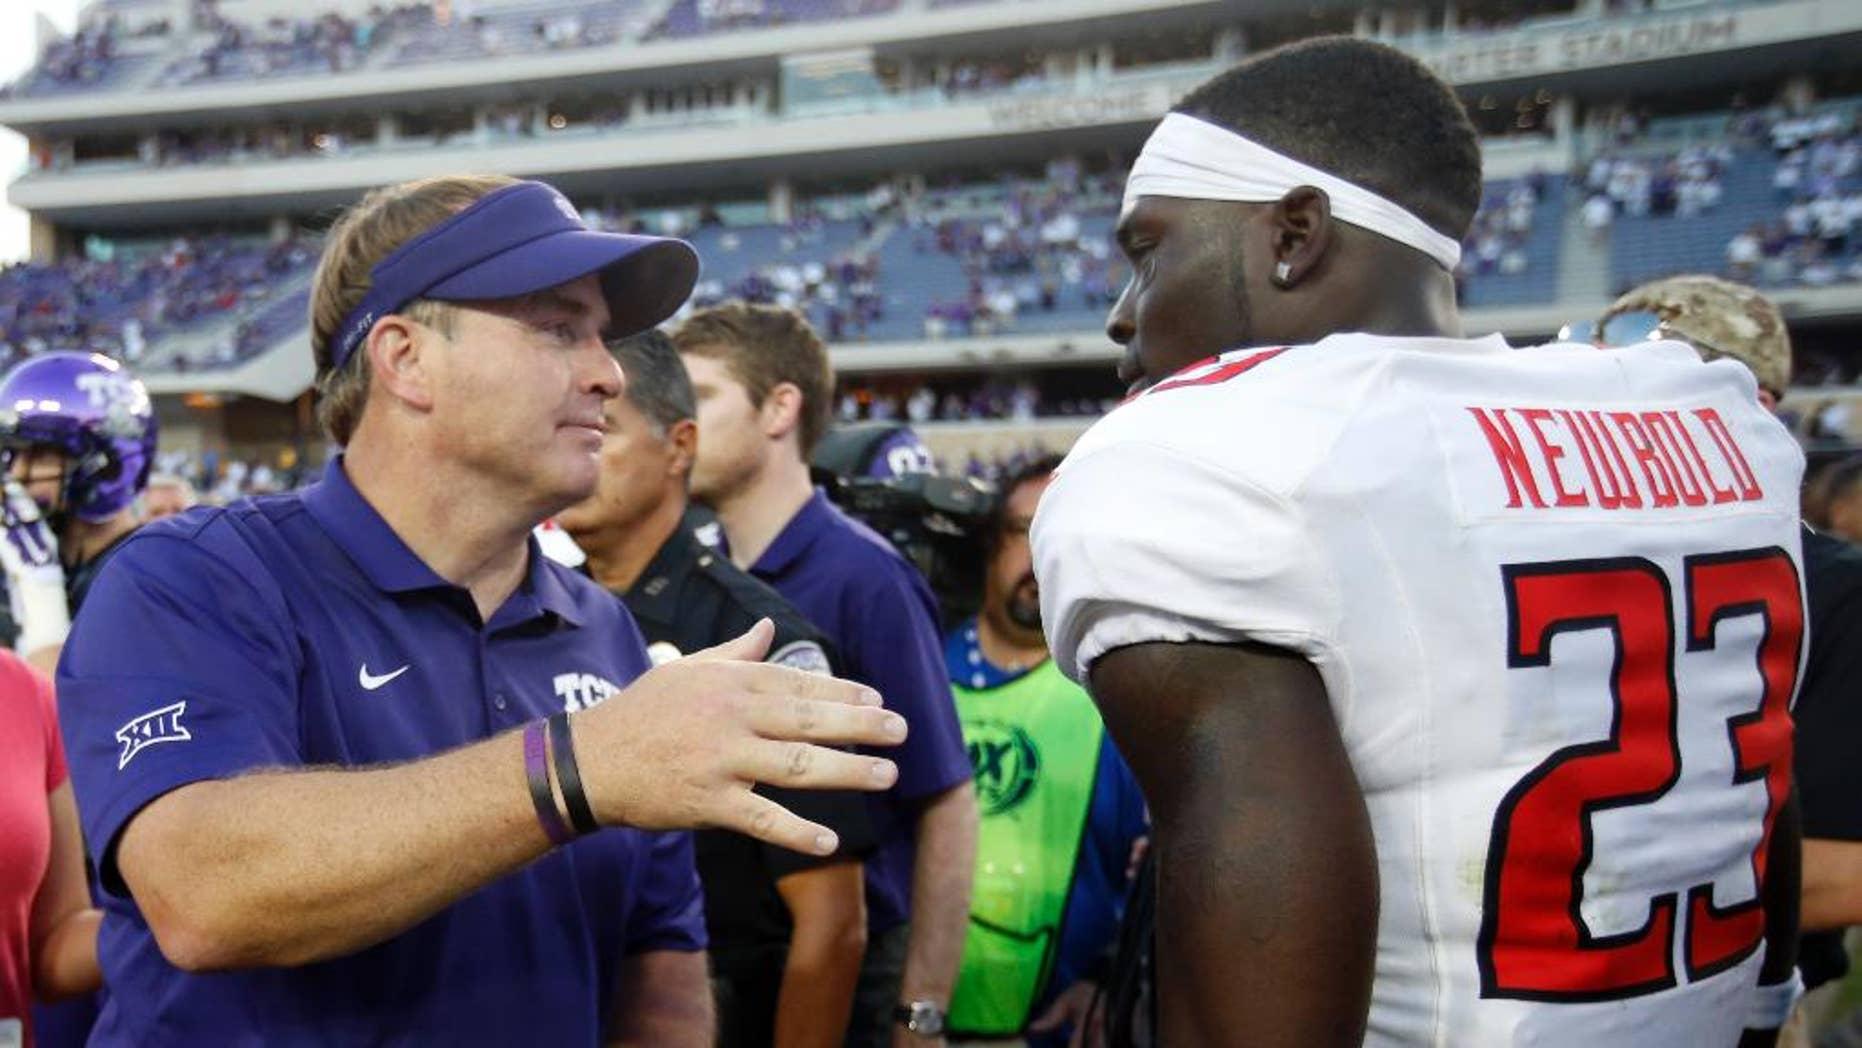 TCU head coach Gary Patterson  talks with Texas Tech defensive back La'Darius Newbold (23) following their NCAA college football game, Saturday, Oct. 25, 2014, in Fort Worth, Texas. TCU won 82-27. (AP Photo/Tony Gutierrez)